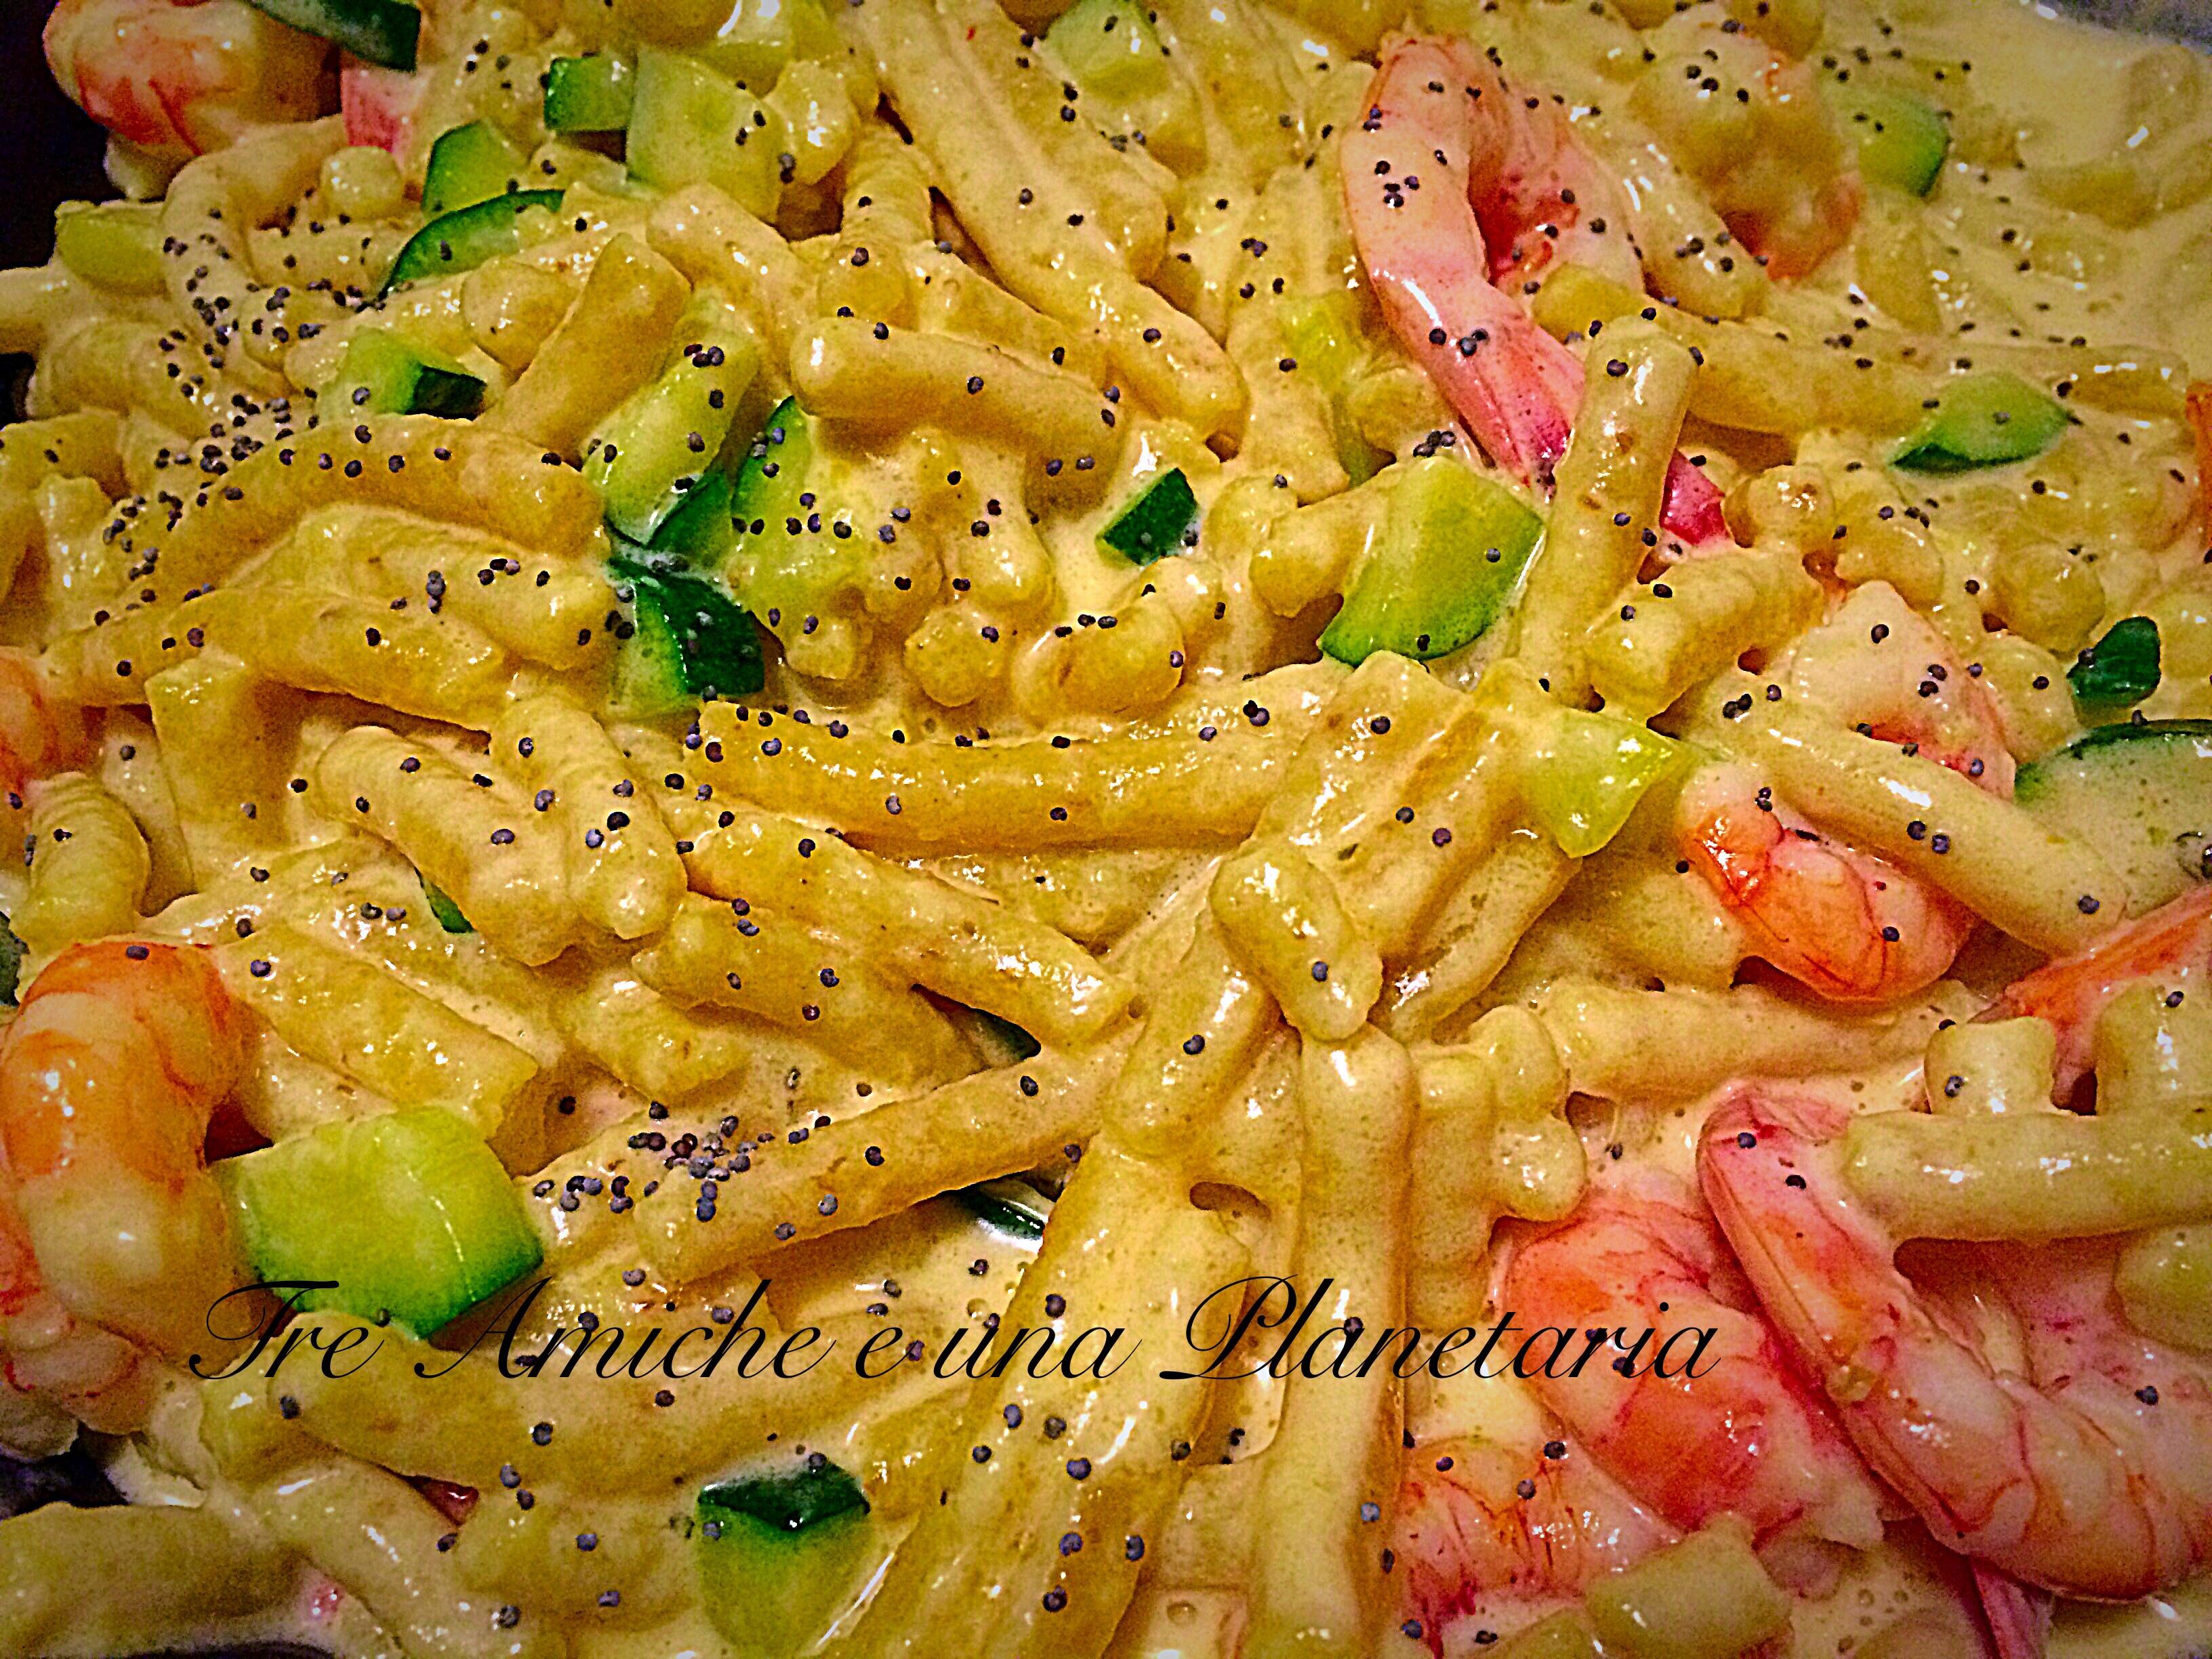 Passatelli asciutti co mascarpone rosa,gamberi e zucchine